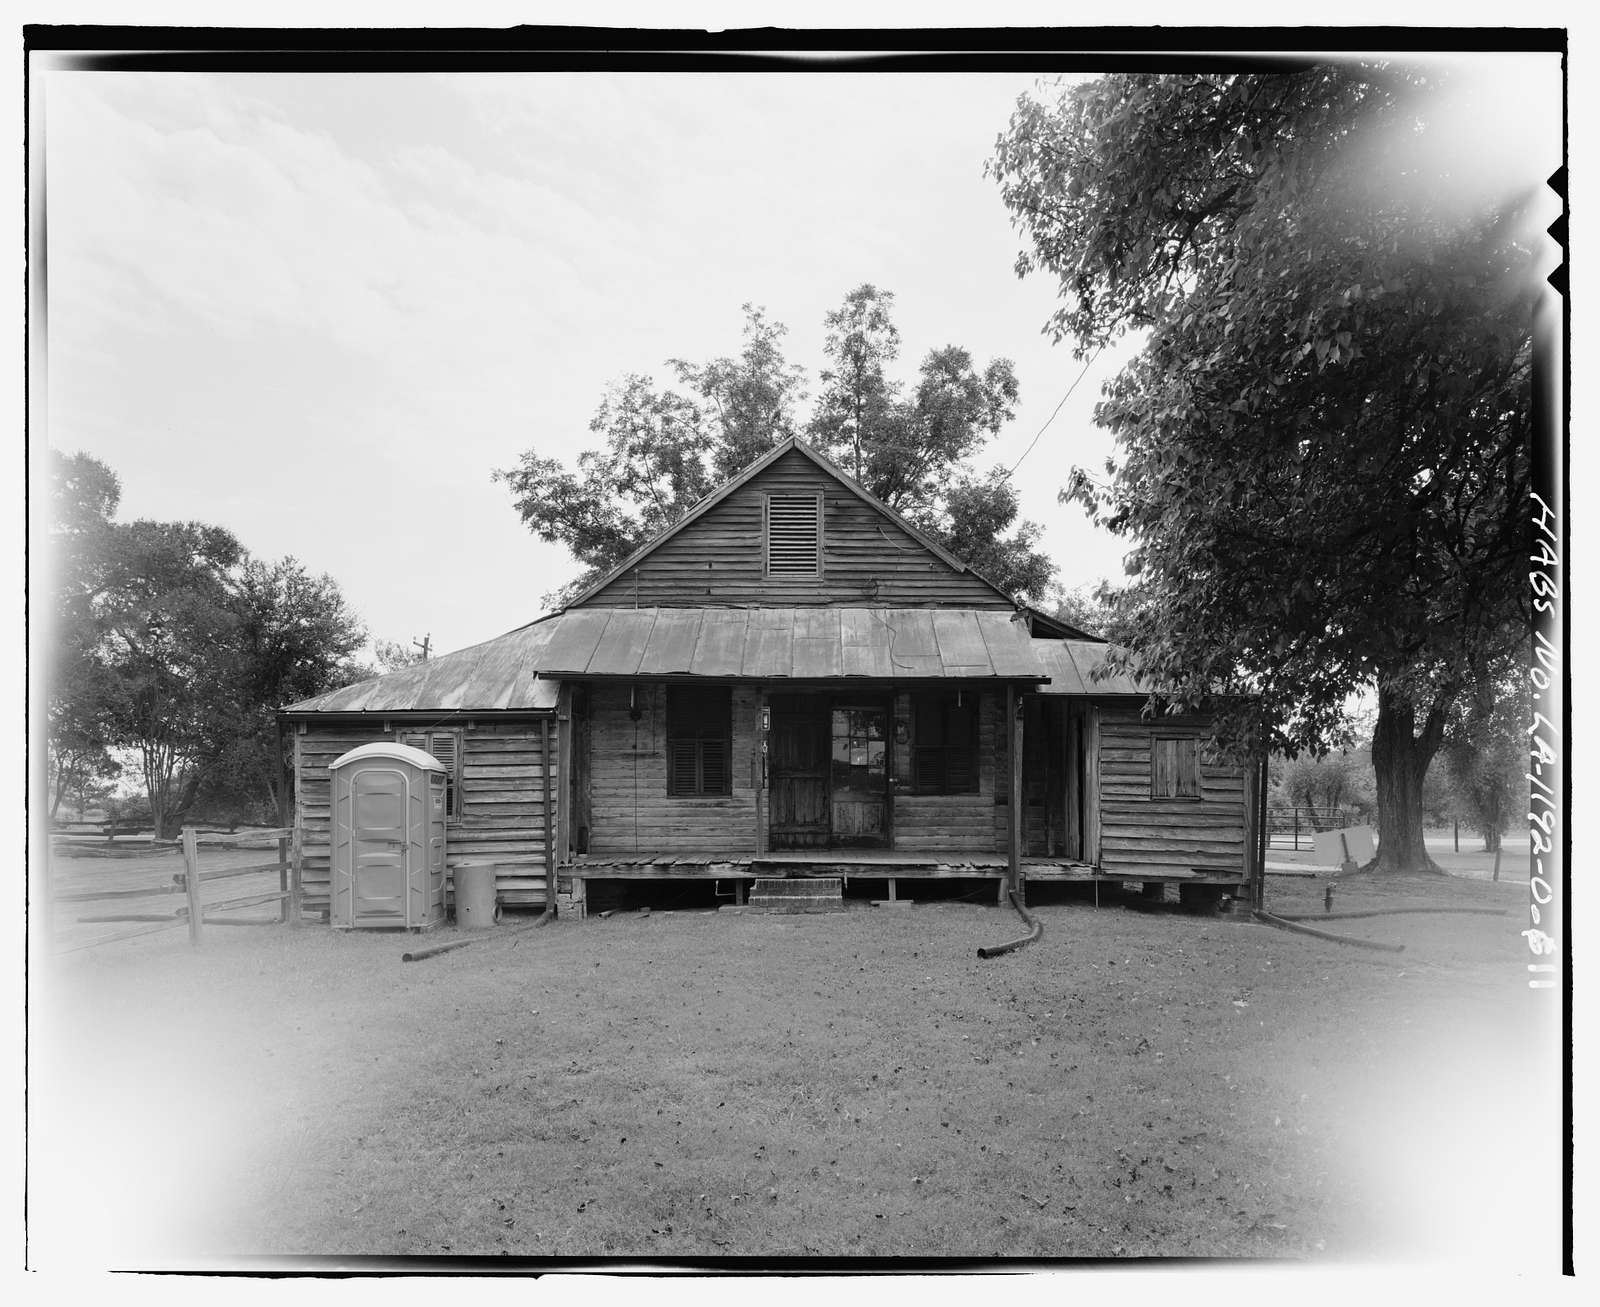 Oakland Plantation, Plantation Store & Post Office, Route 494, Bermuda, Natchitoches Parish, LA